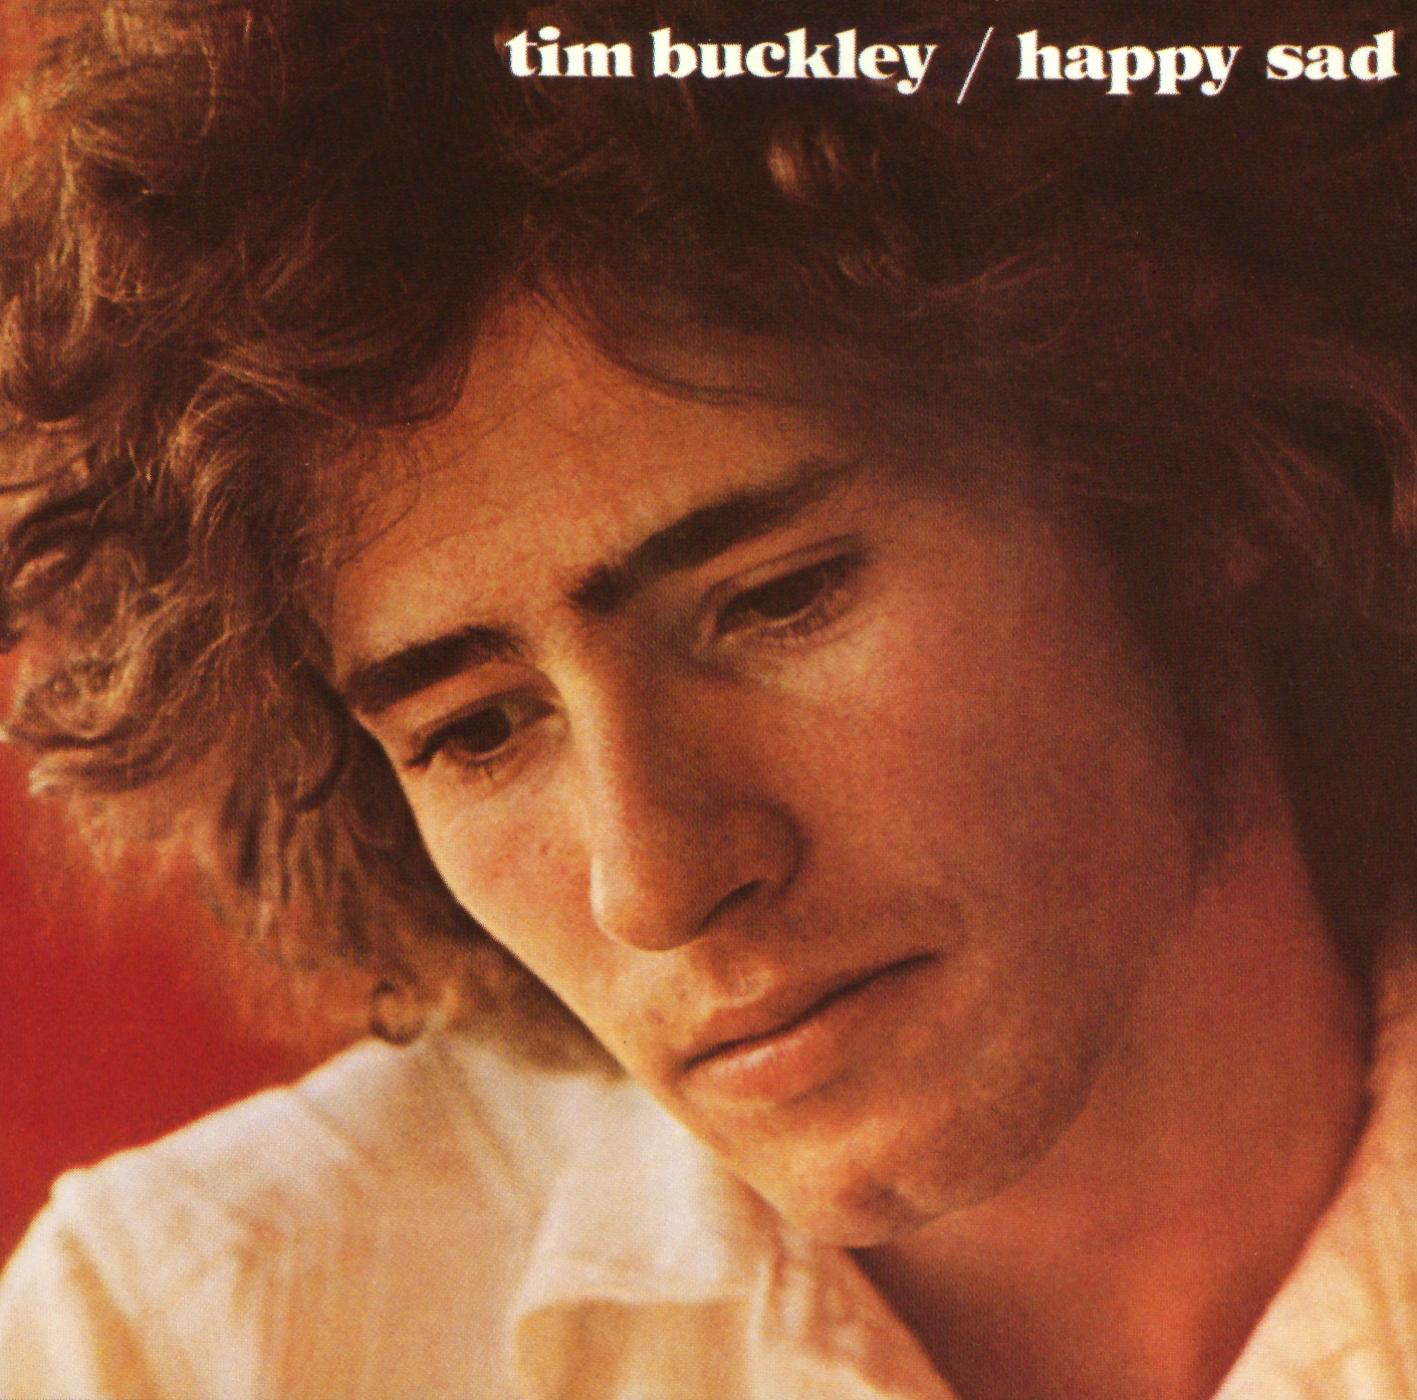 Tim Buckley - Happy Sad [LTD LP]